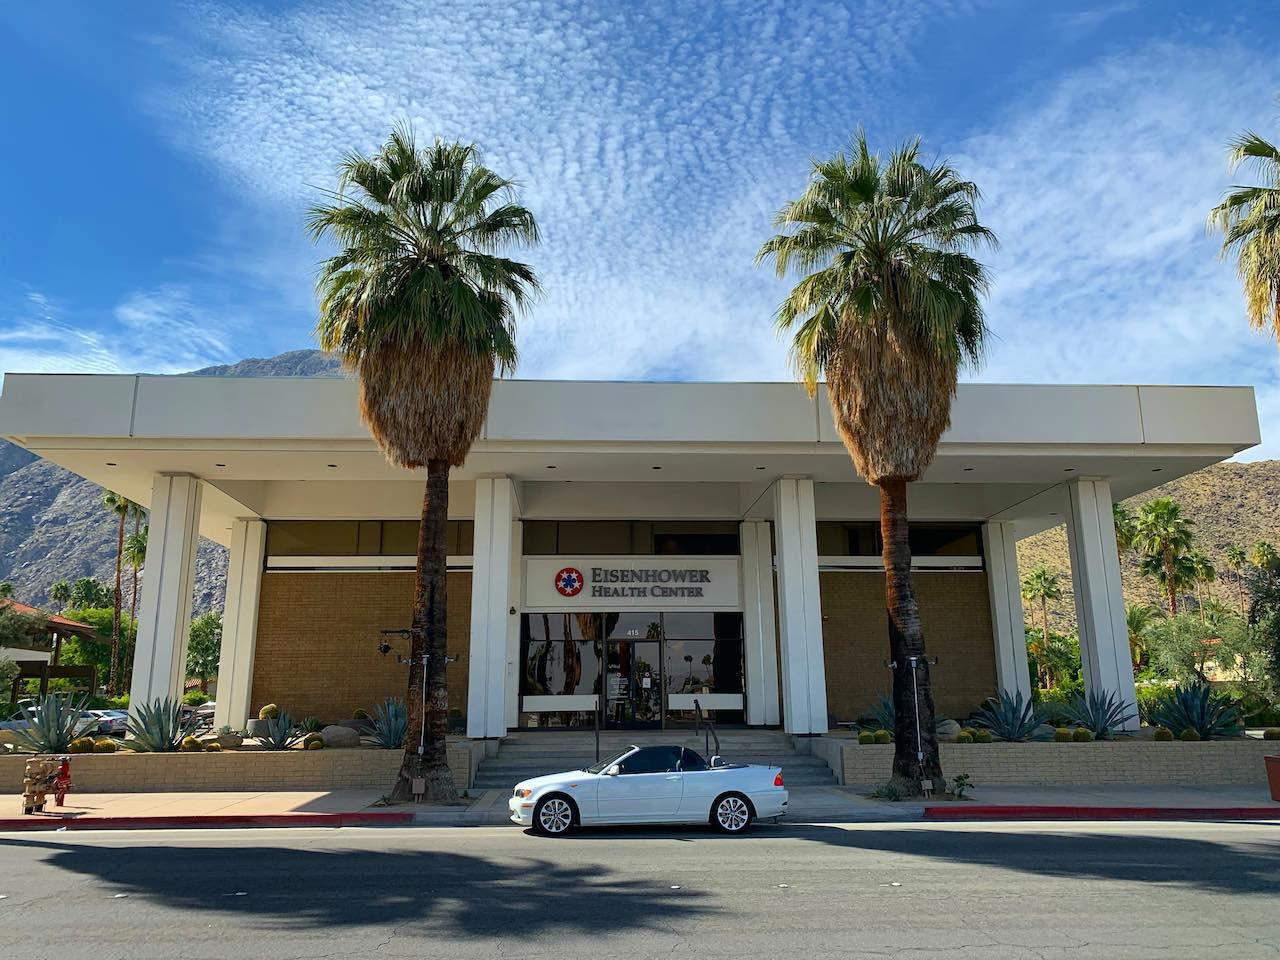 Palm Springs Modernism Building